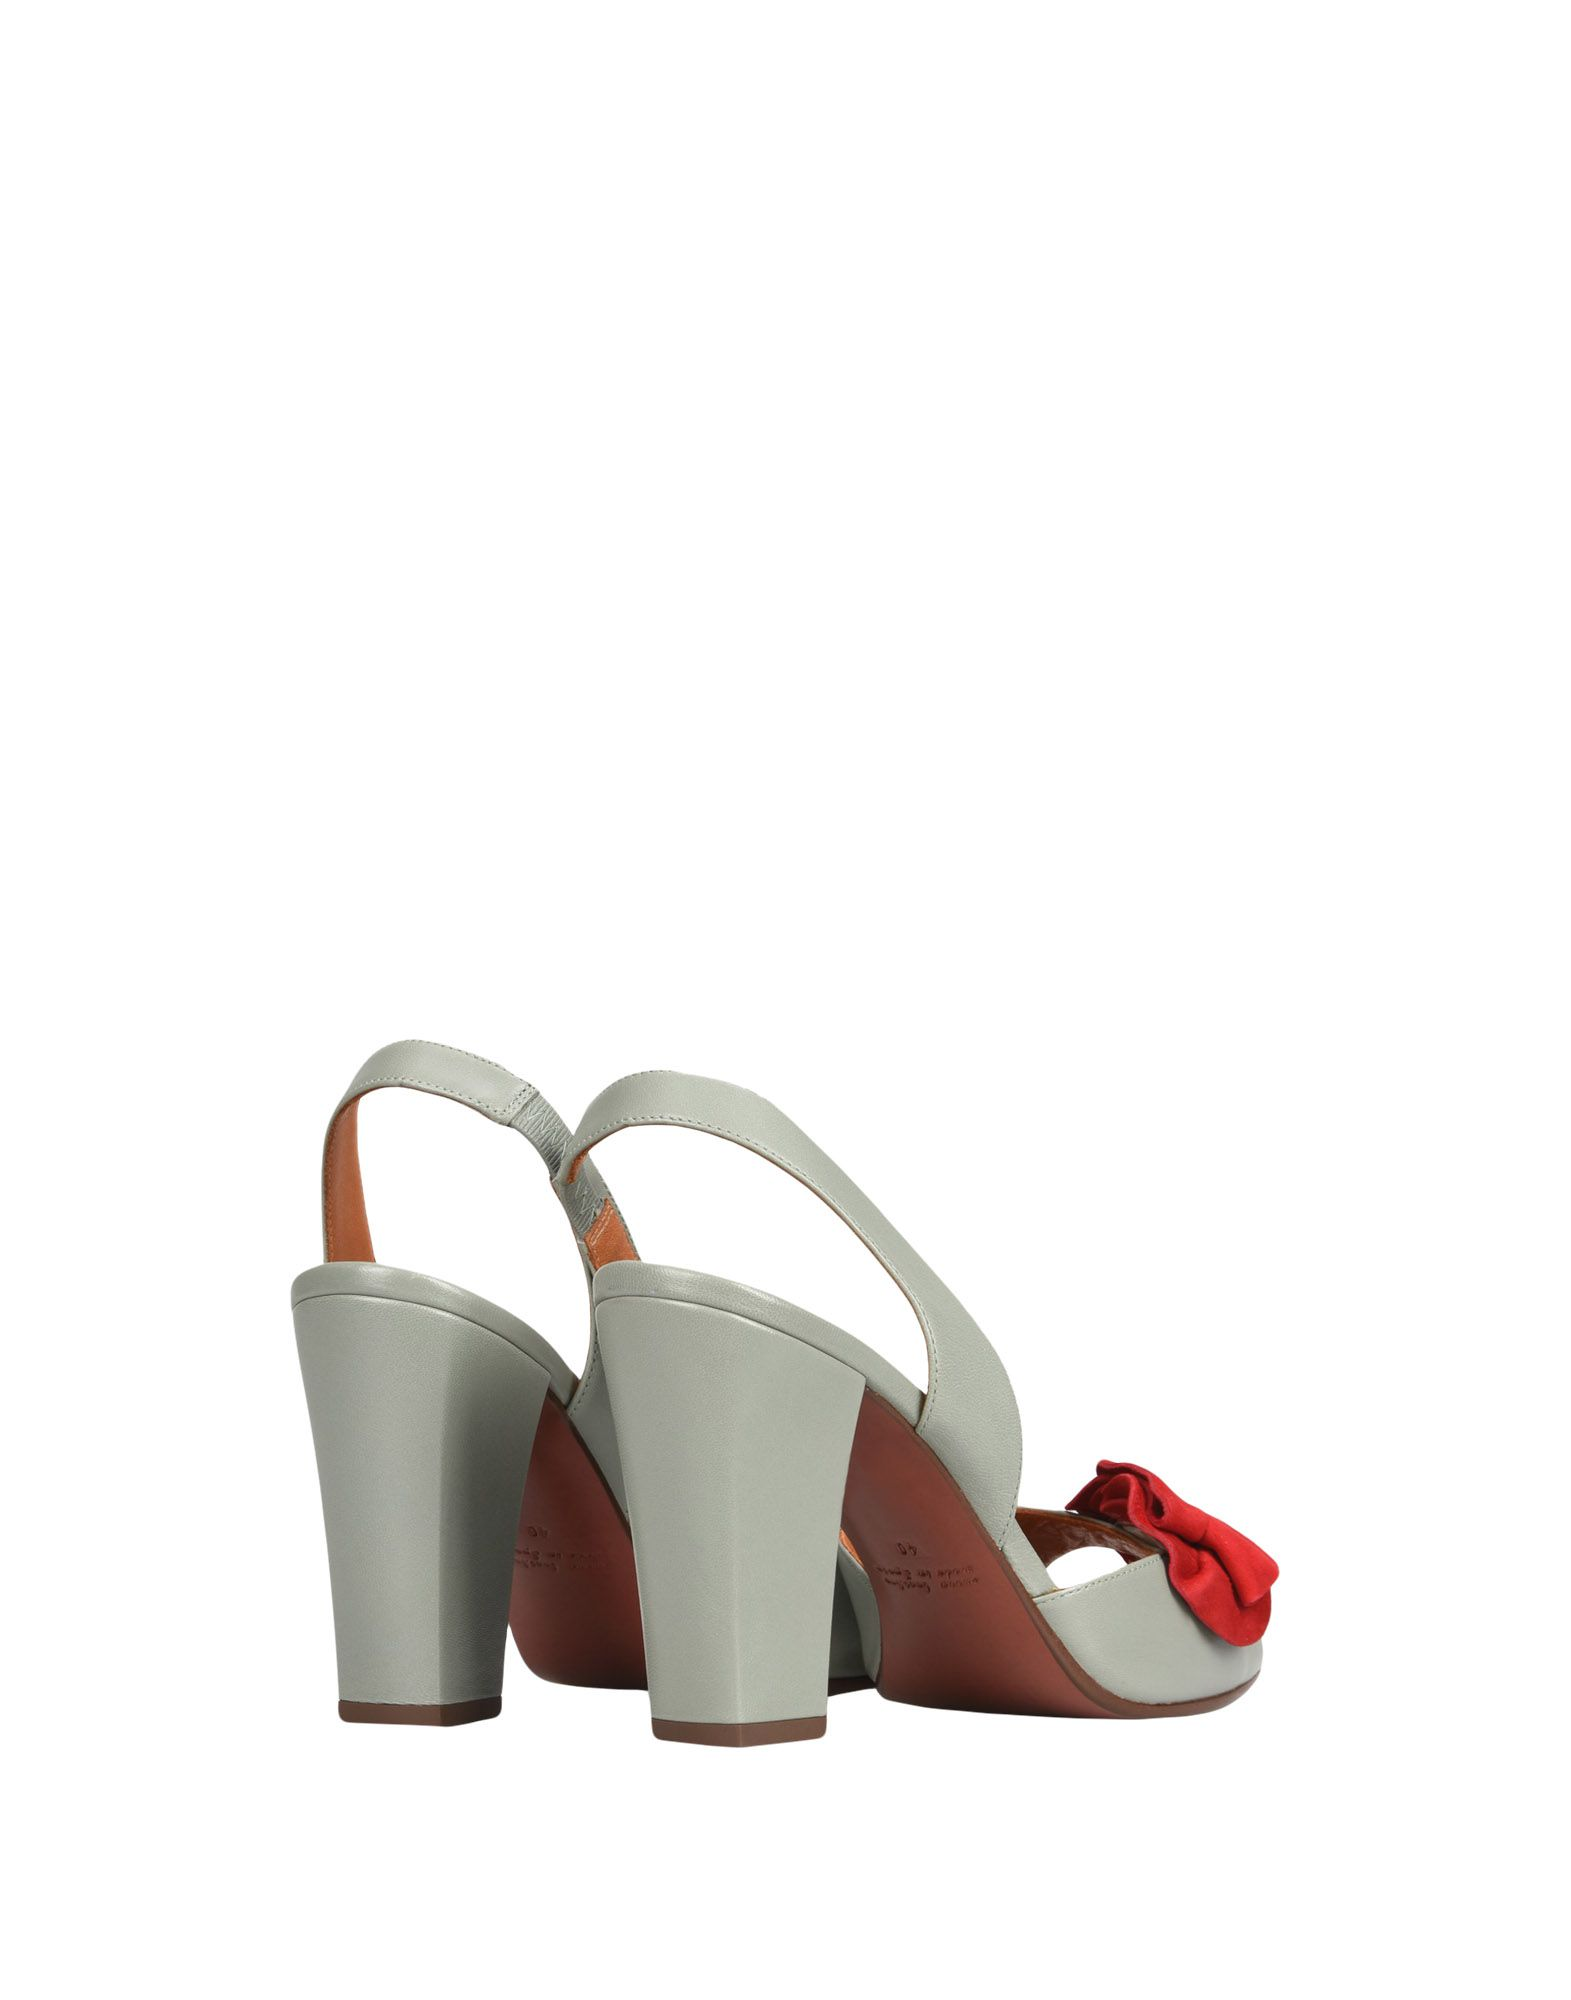 11212306OR Chie Mihara Anami1  11212306OR  Heiße Schuhe ea55df